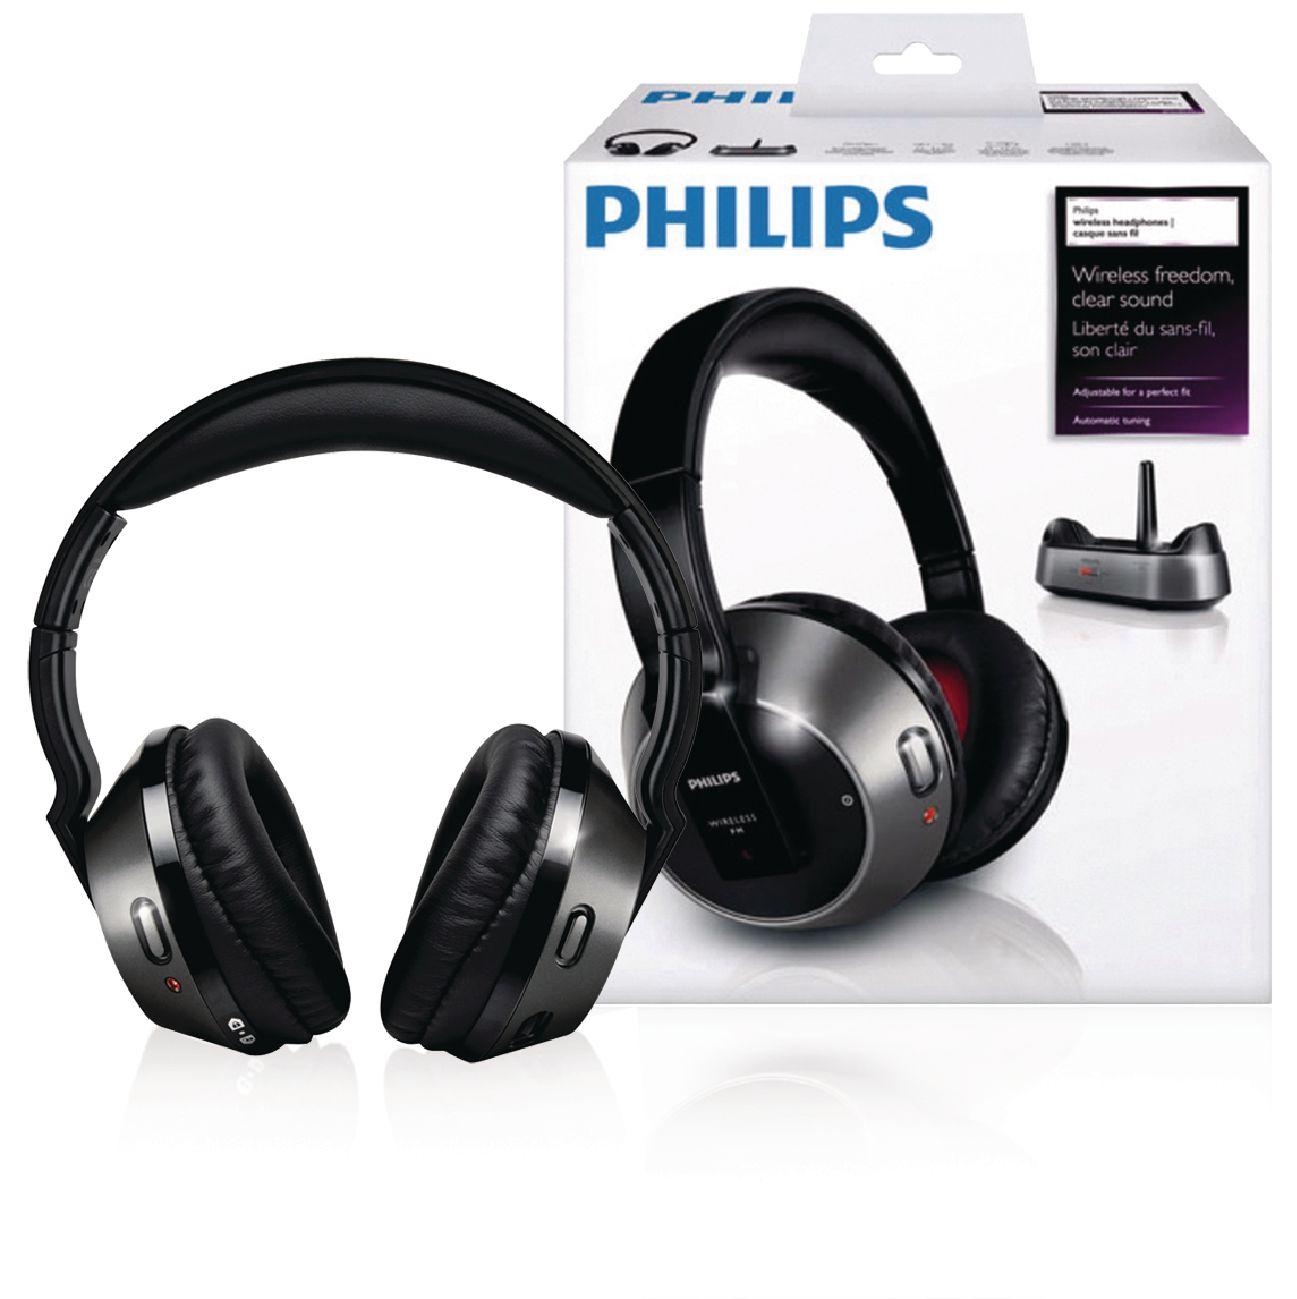 Shc8535 philips shc8535 wireless hi fi headphone